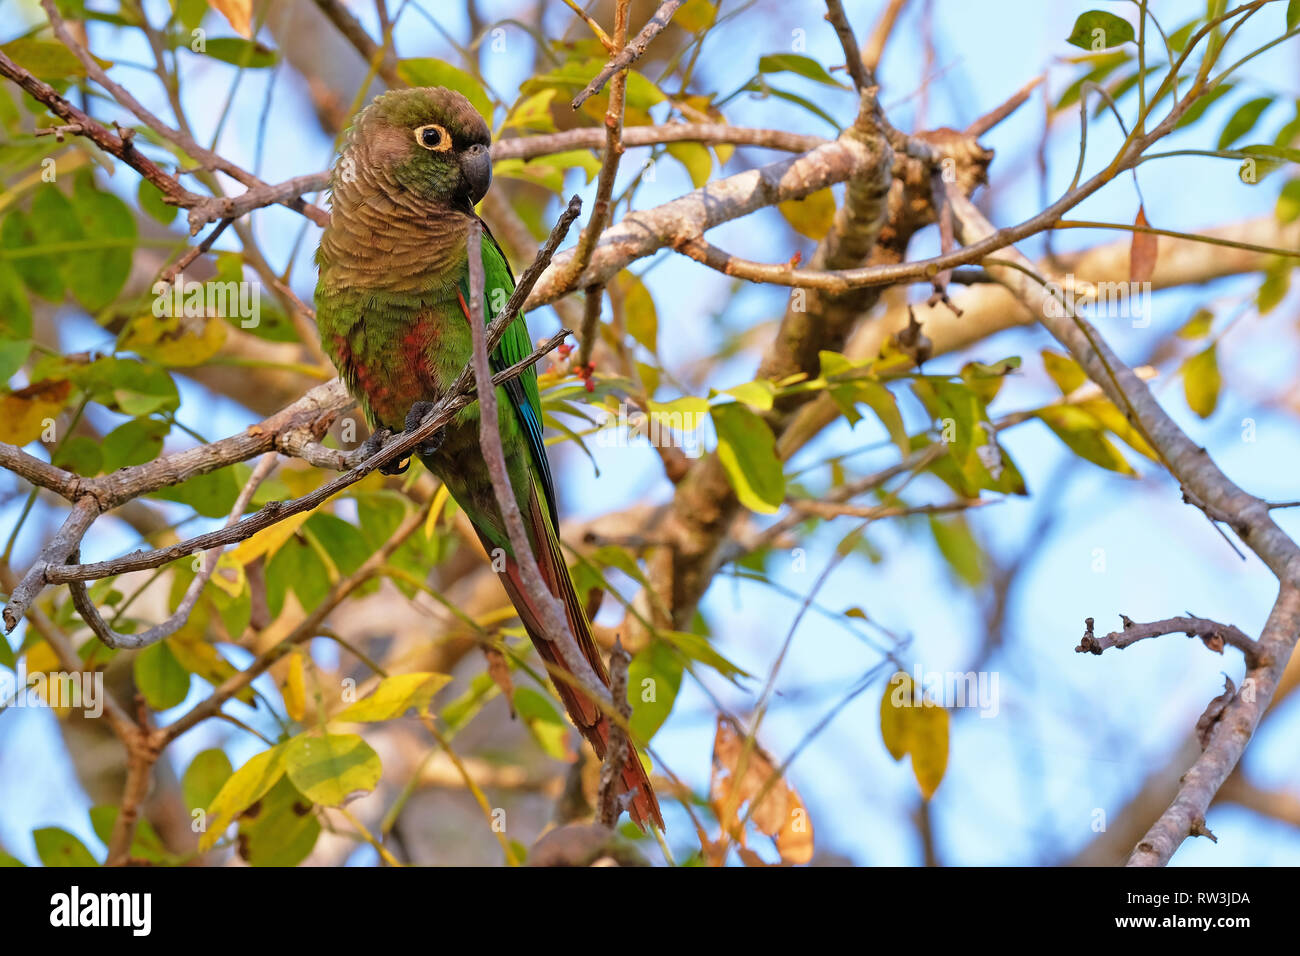 Scaly-headed Parrot, Pionus Maximiliani, perching on a branch in Pantanal, Aquidauana, Mato Grosso Do Sul, Brazil - Stock Image